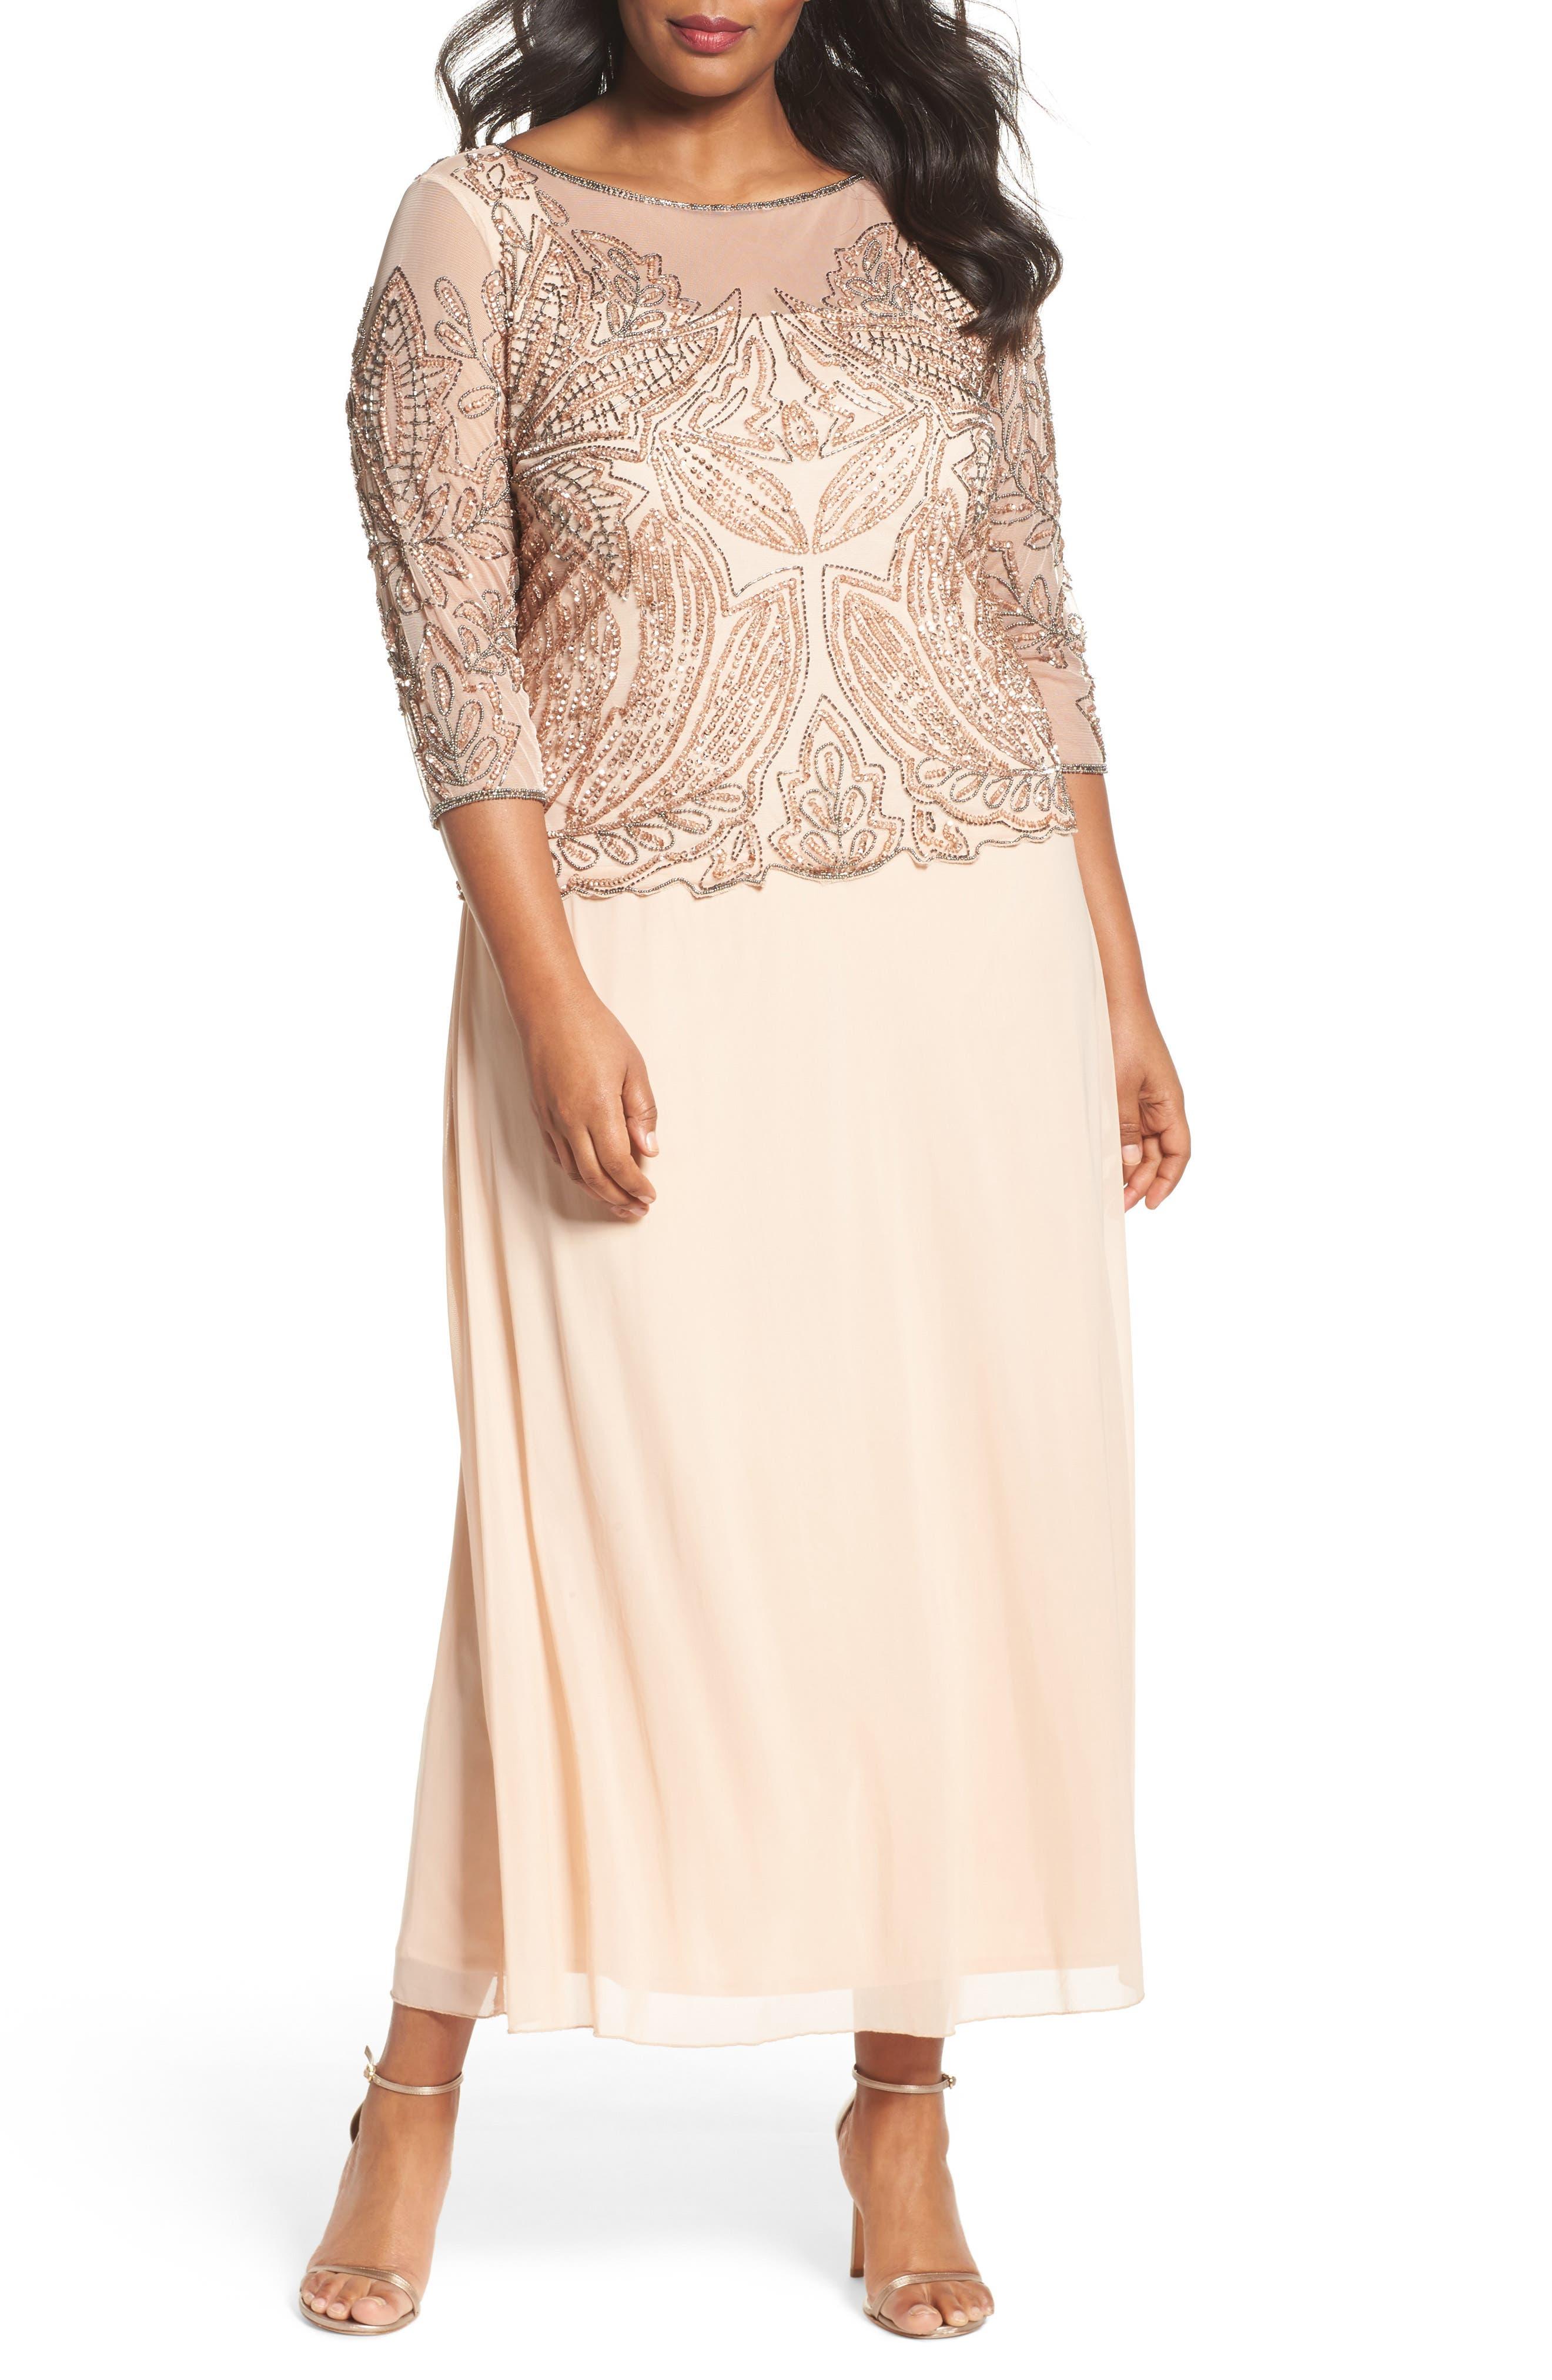 Plus size nordstrom dresses